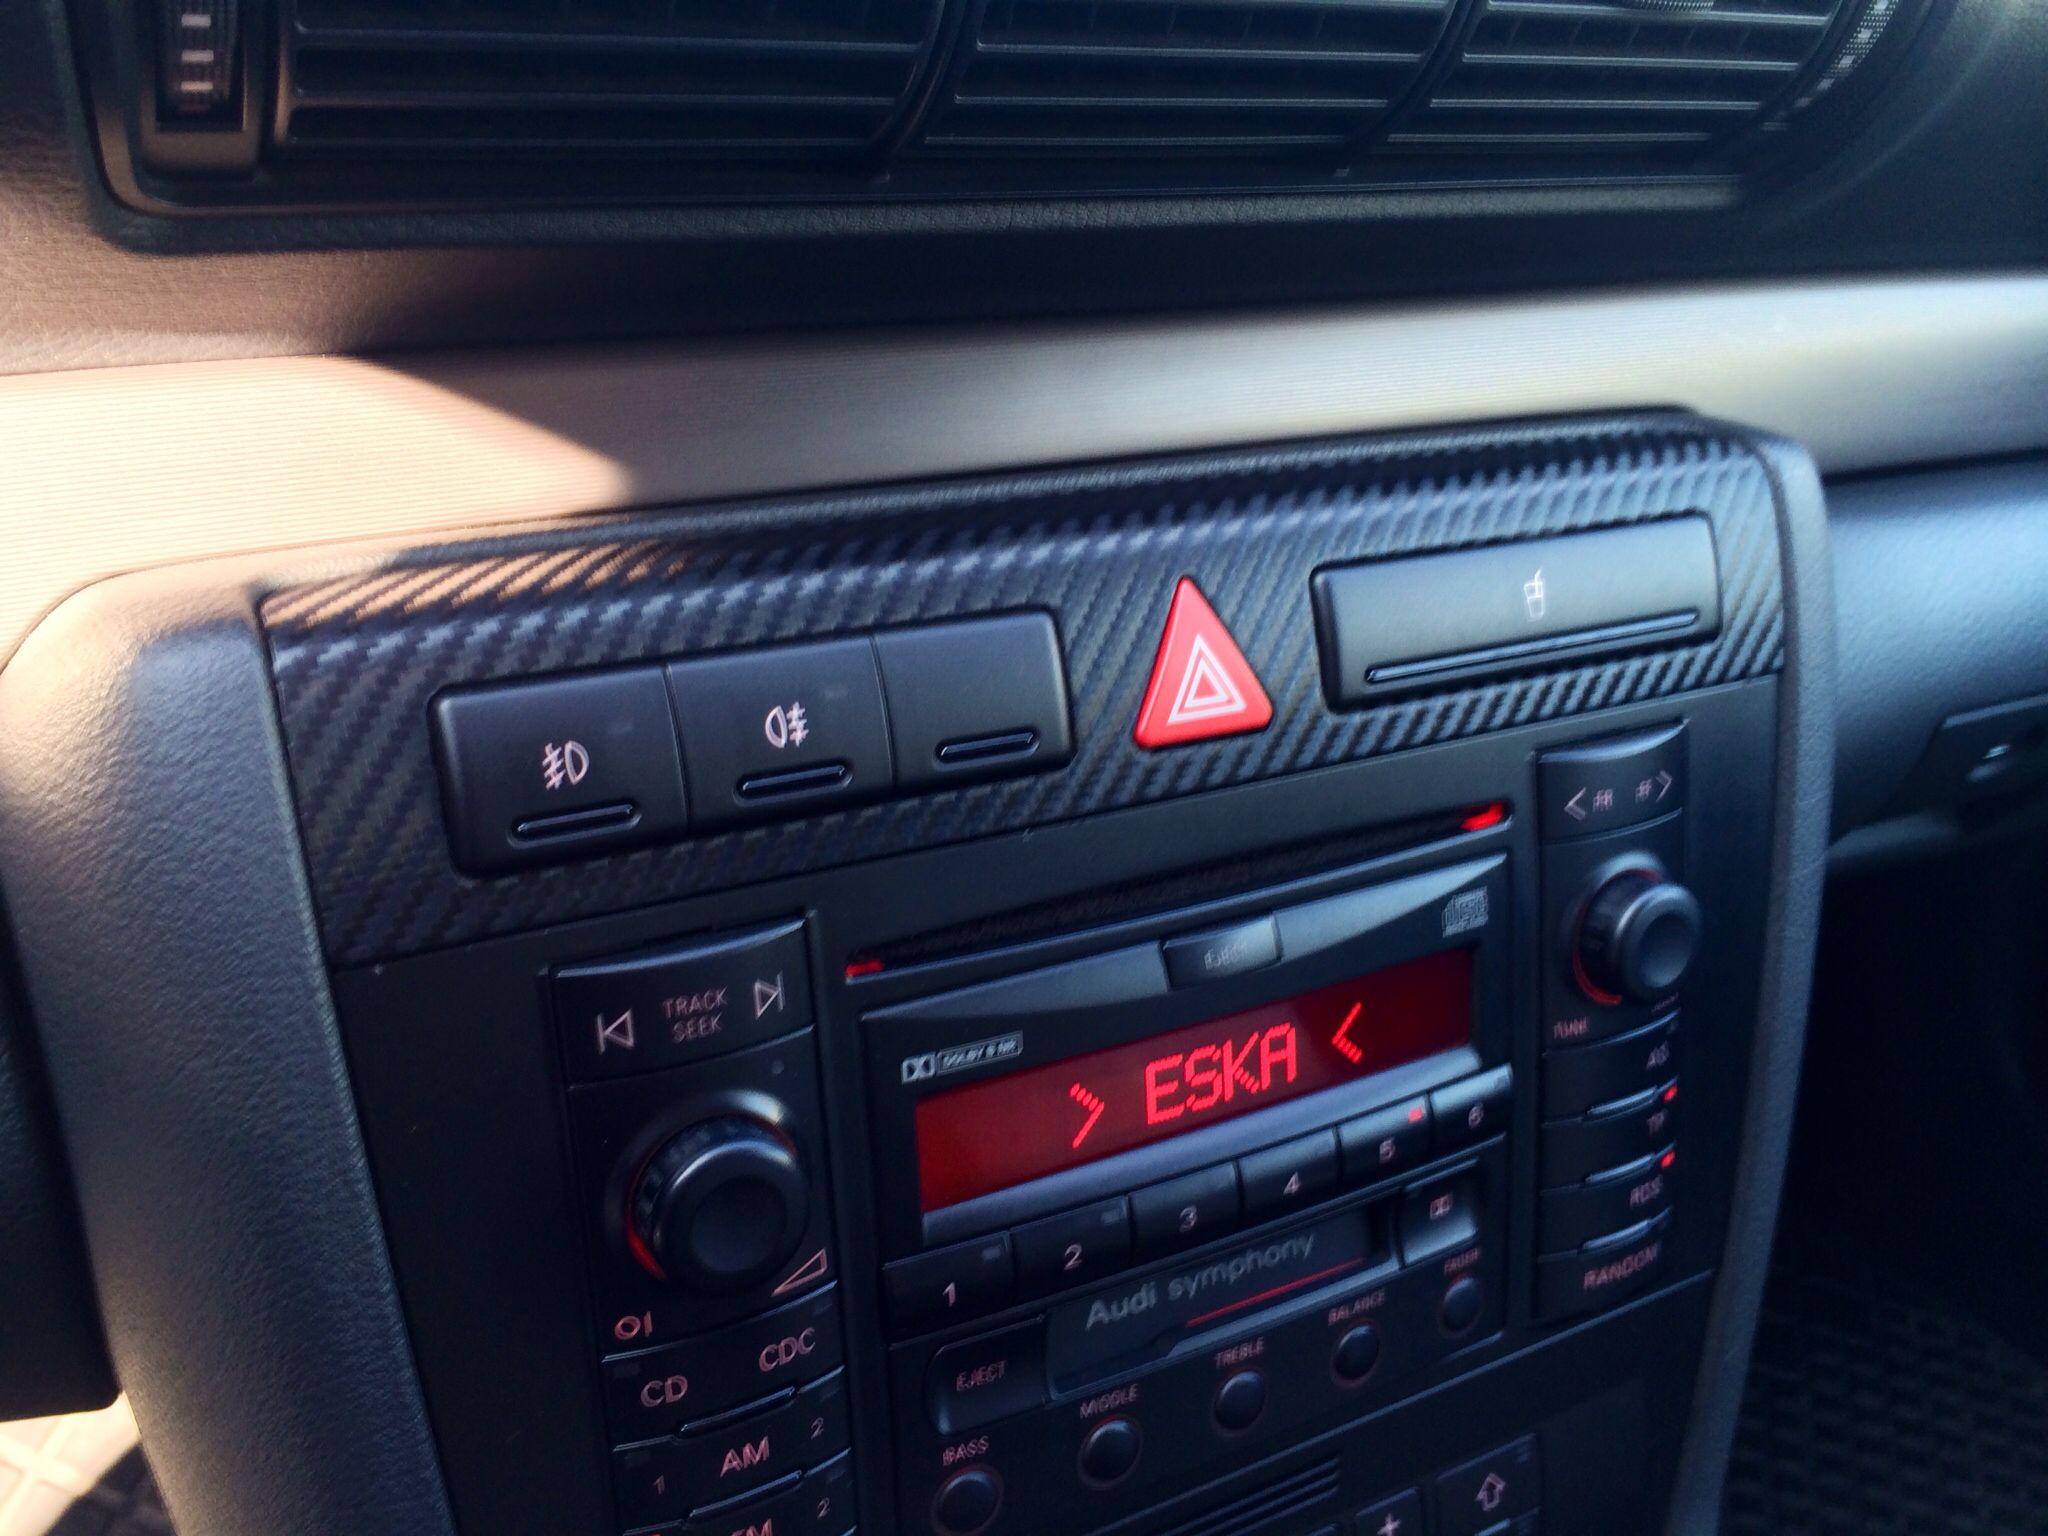 Folia Carbon 3m Audi A4 B5 Audi A4 Audi Car Radio